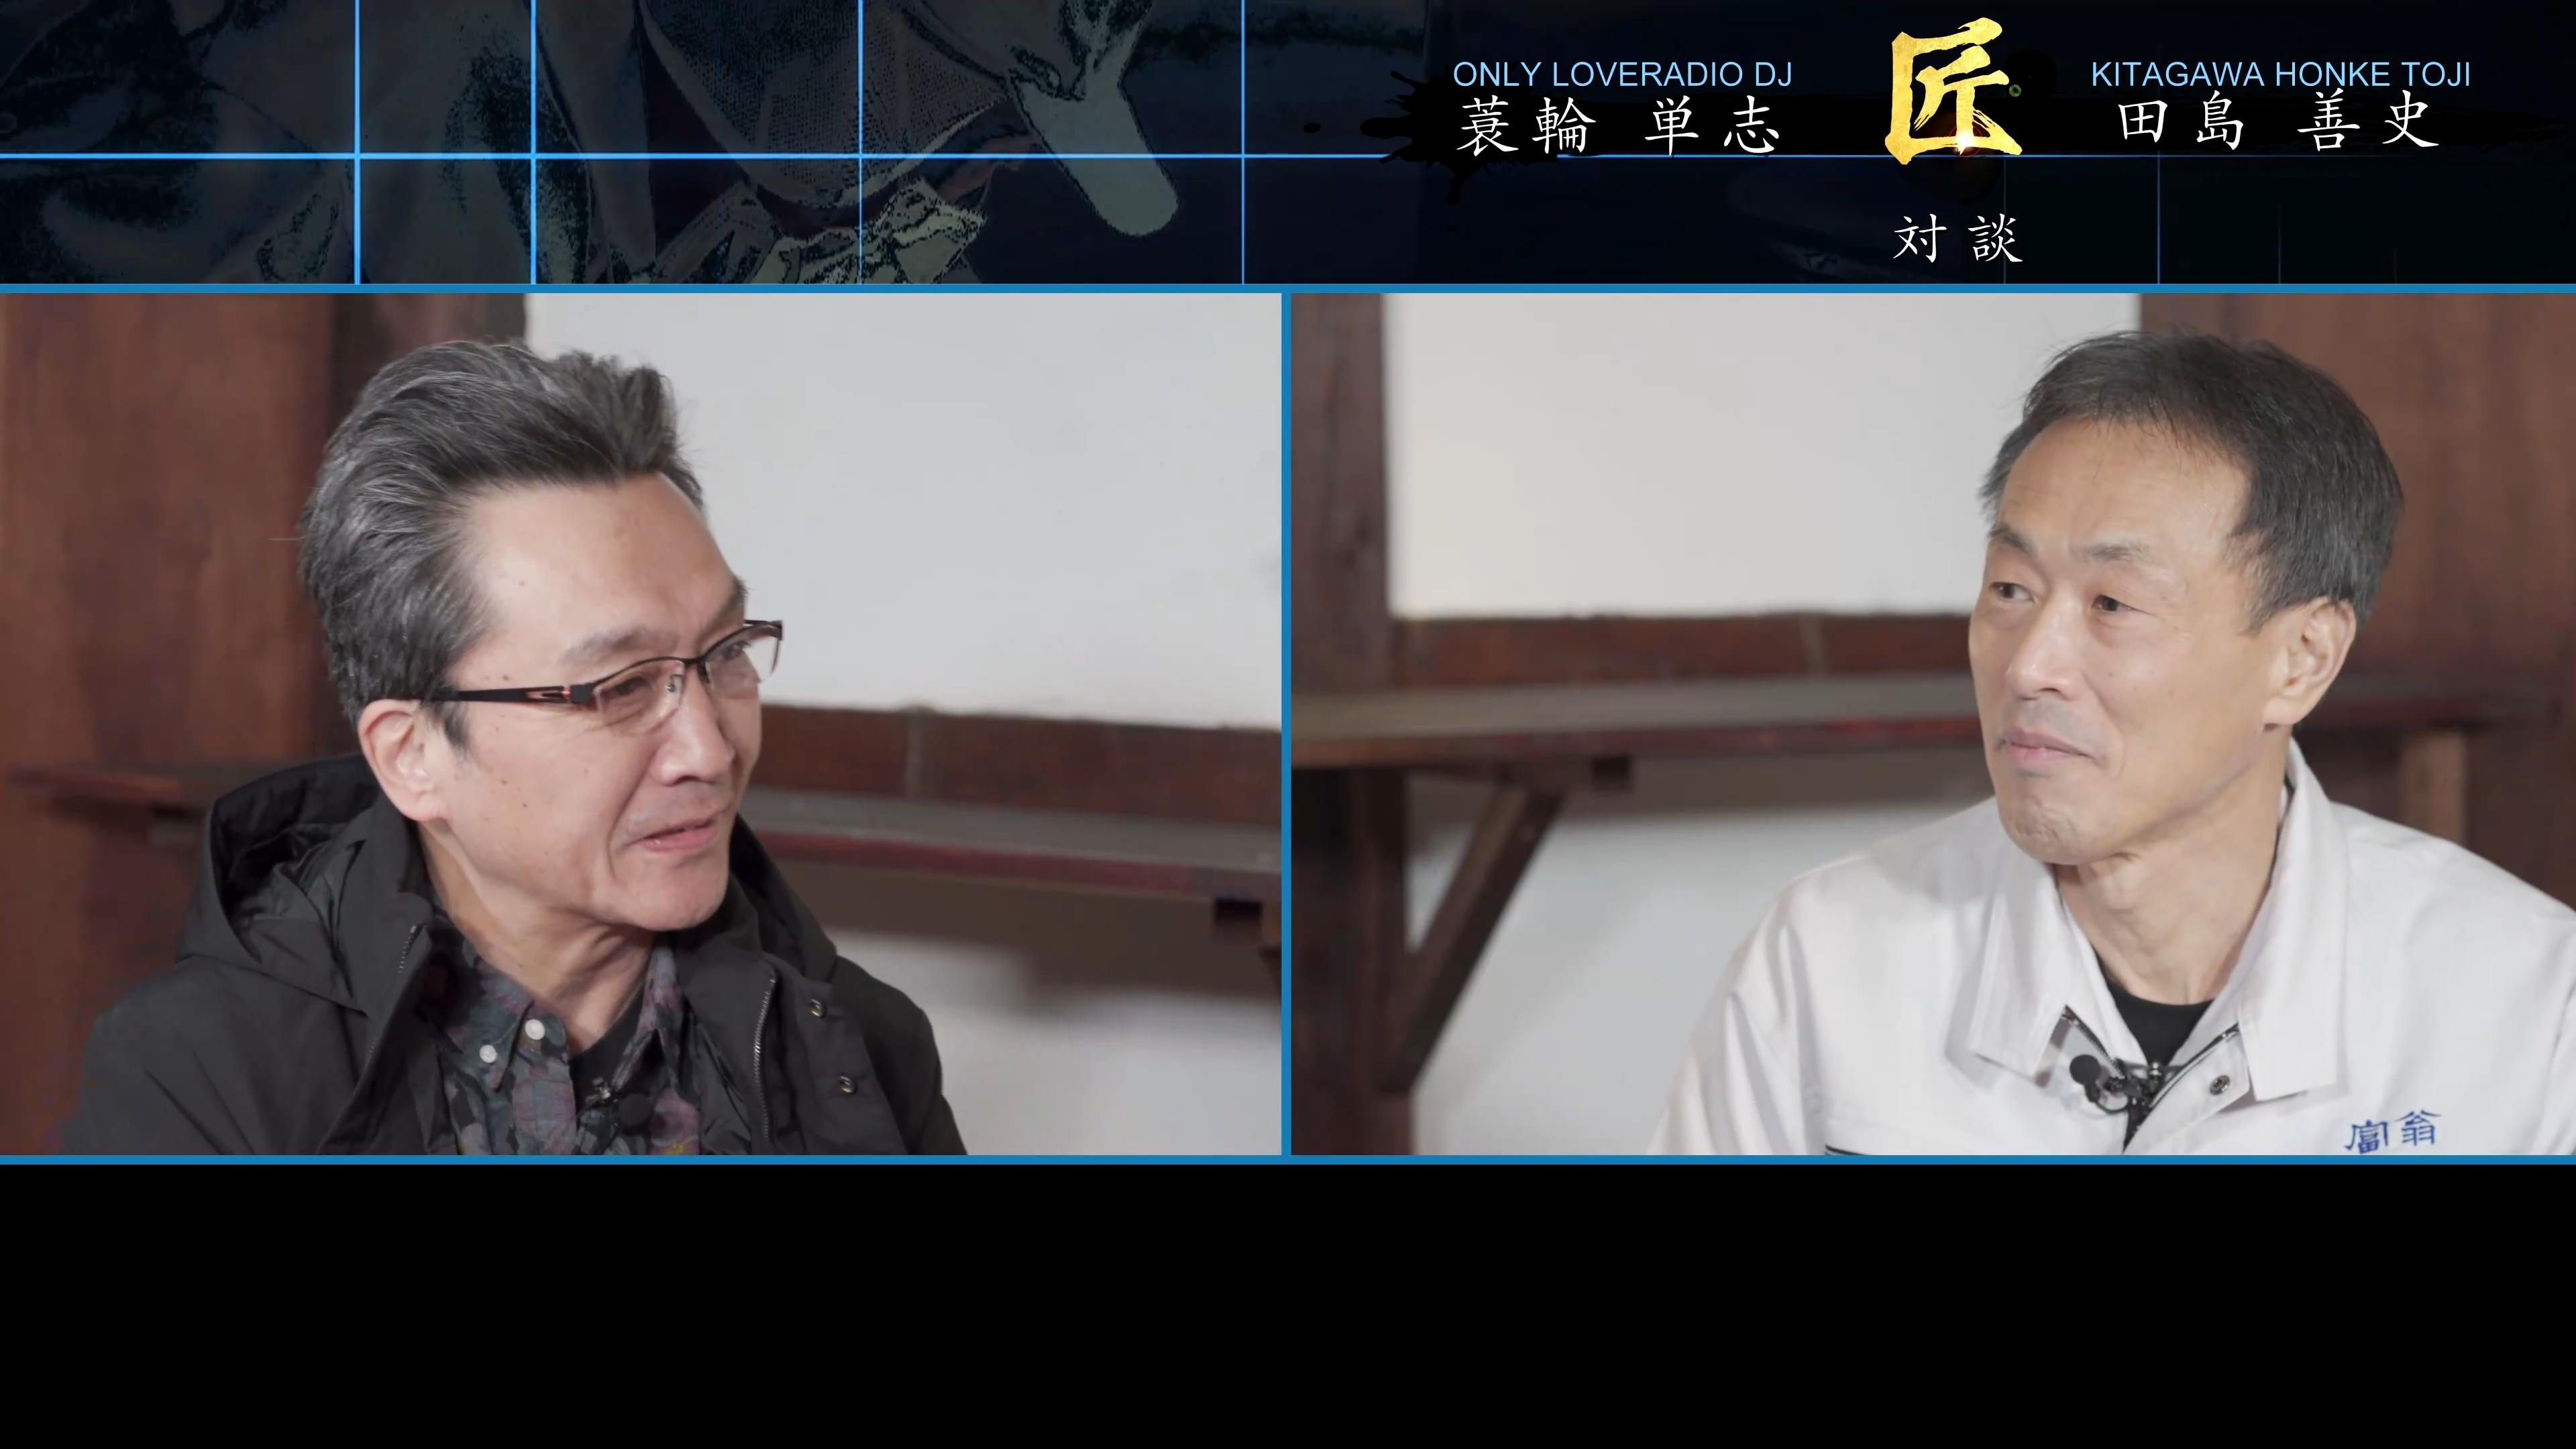 AFTER ONLYLOVERADIO 匠対談 株式会社北川本家 杜氏 田島善史編